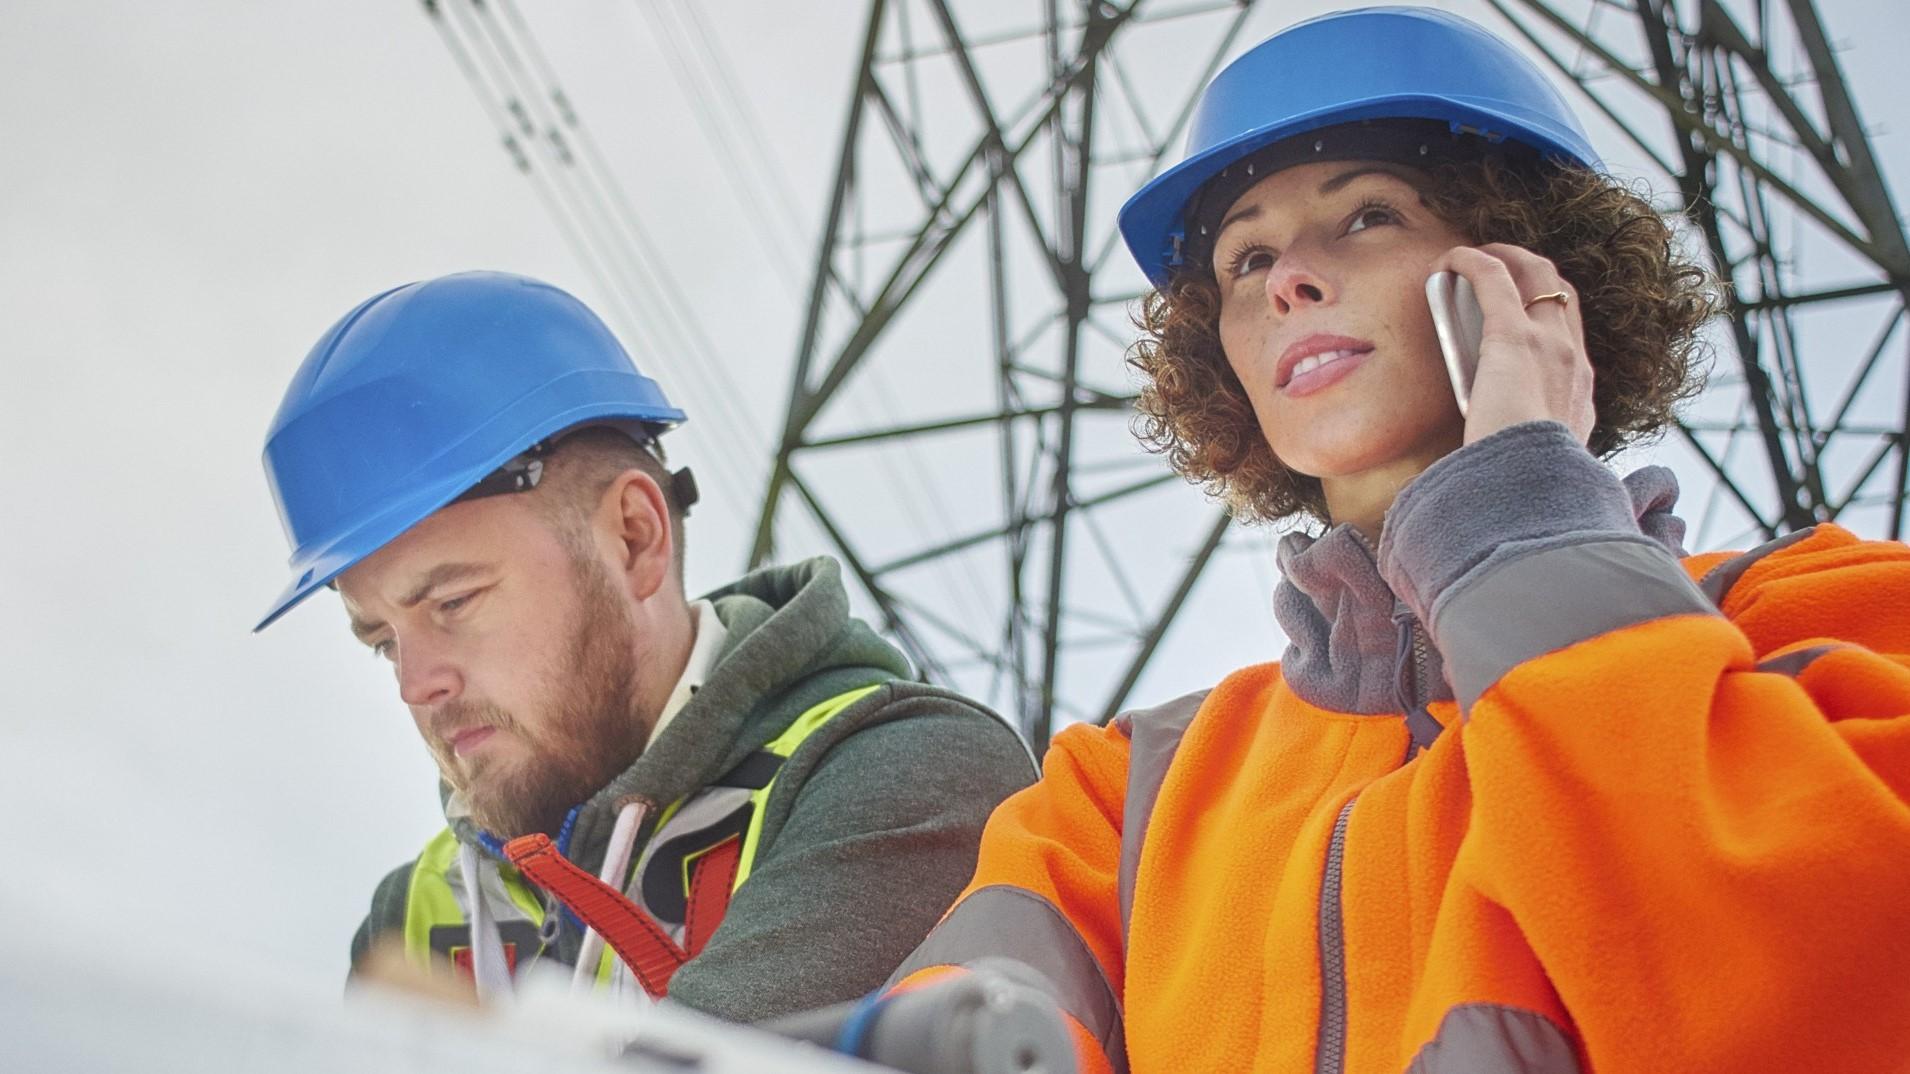 electricity-engineers-beneath-a-pylon-Electricity-Pylon-Working-Industry-Occupation copy - Copy.jpg